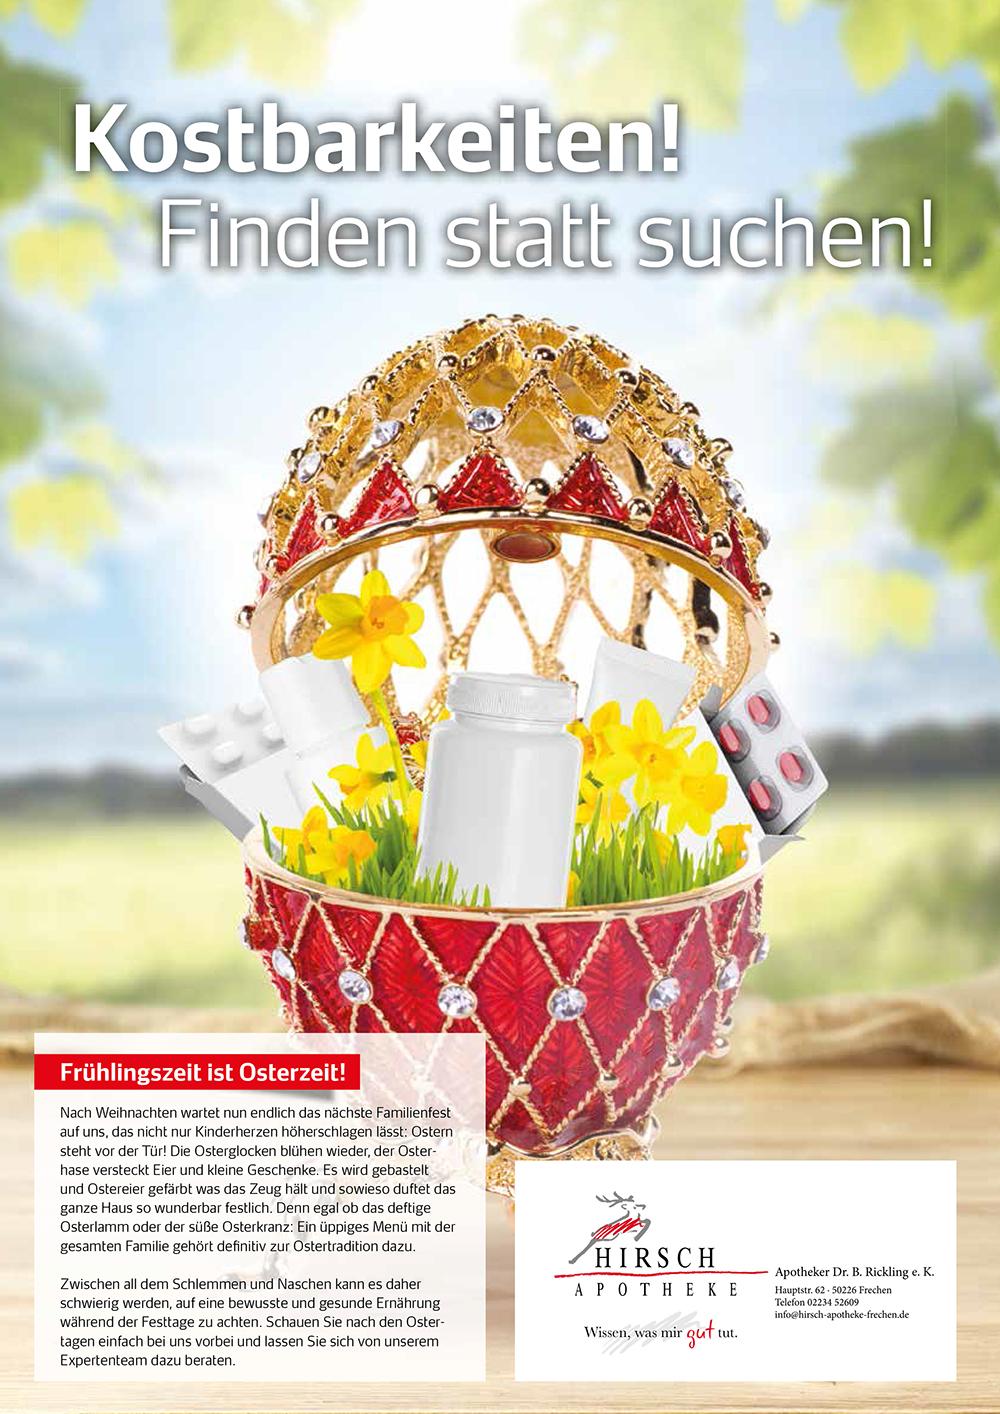 http://www.apotheken.de/fileadmin/clubarea/00000-Angebote/50226_hirsch_angebot_1.jpg